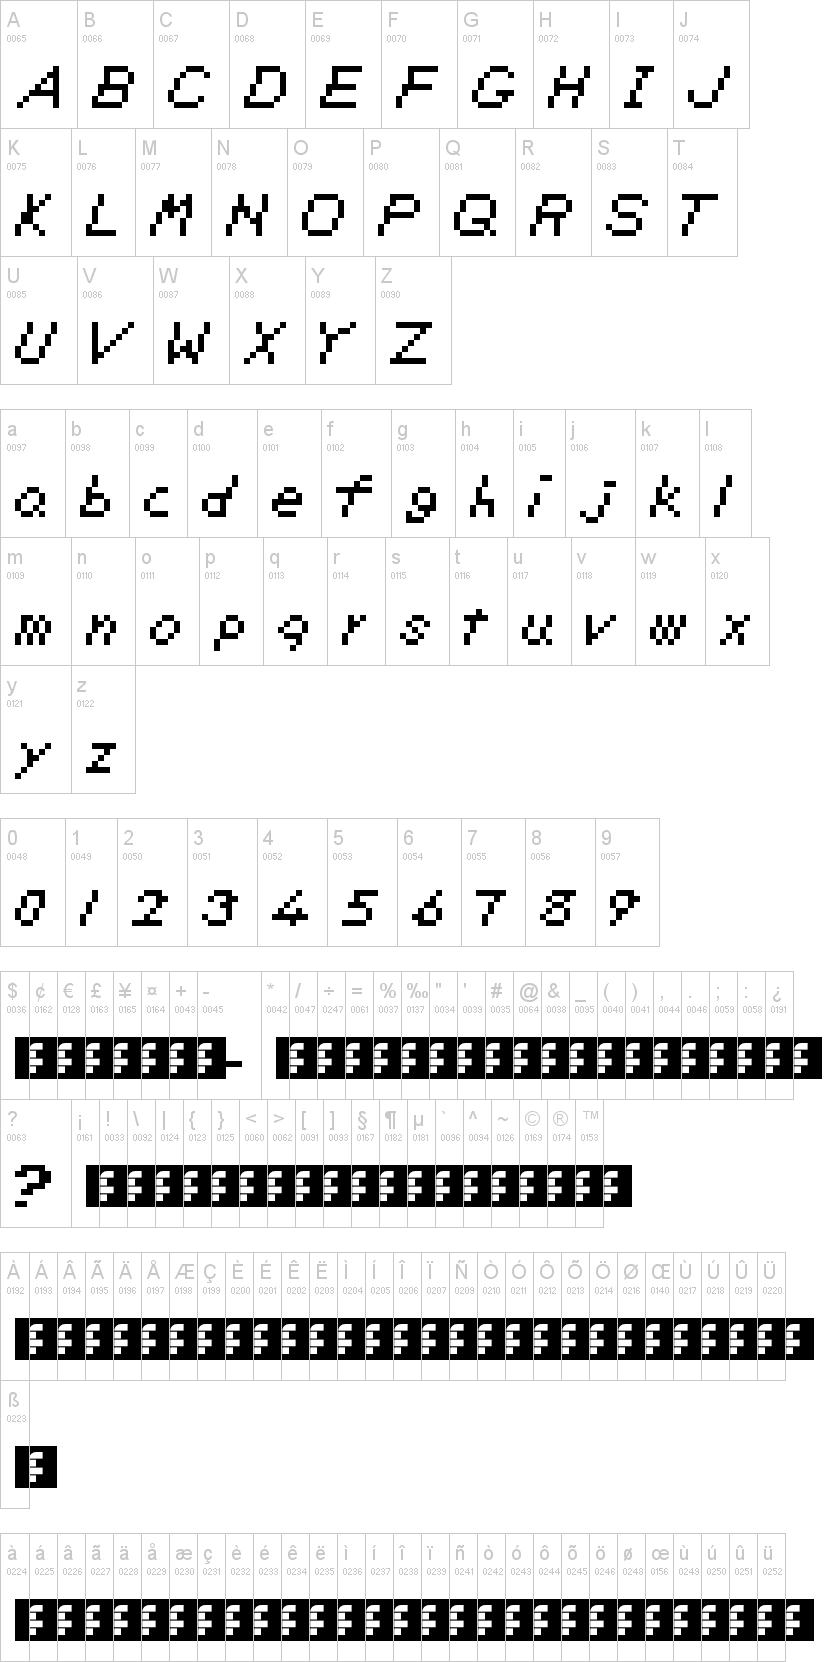 Tloz Link S Awakening Font Dafont Com